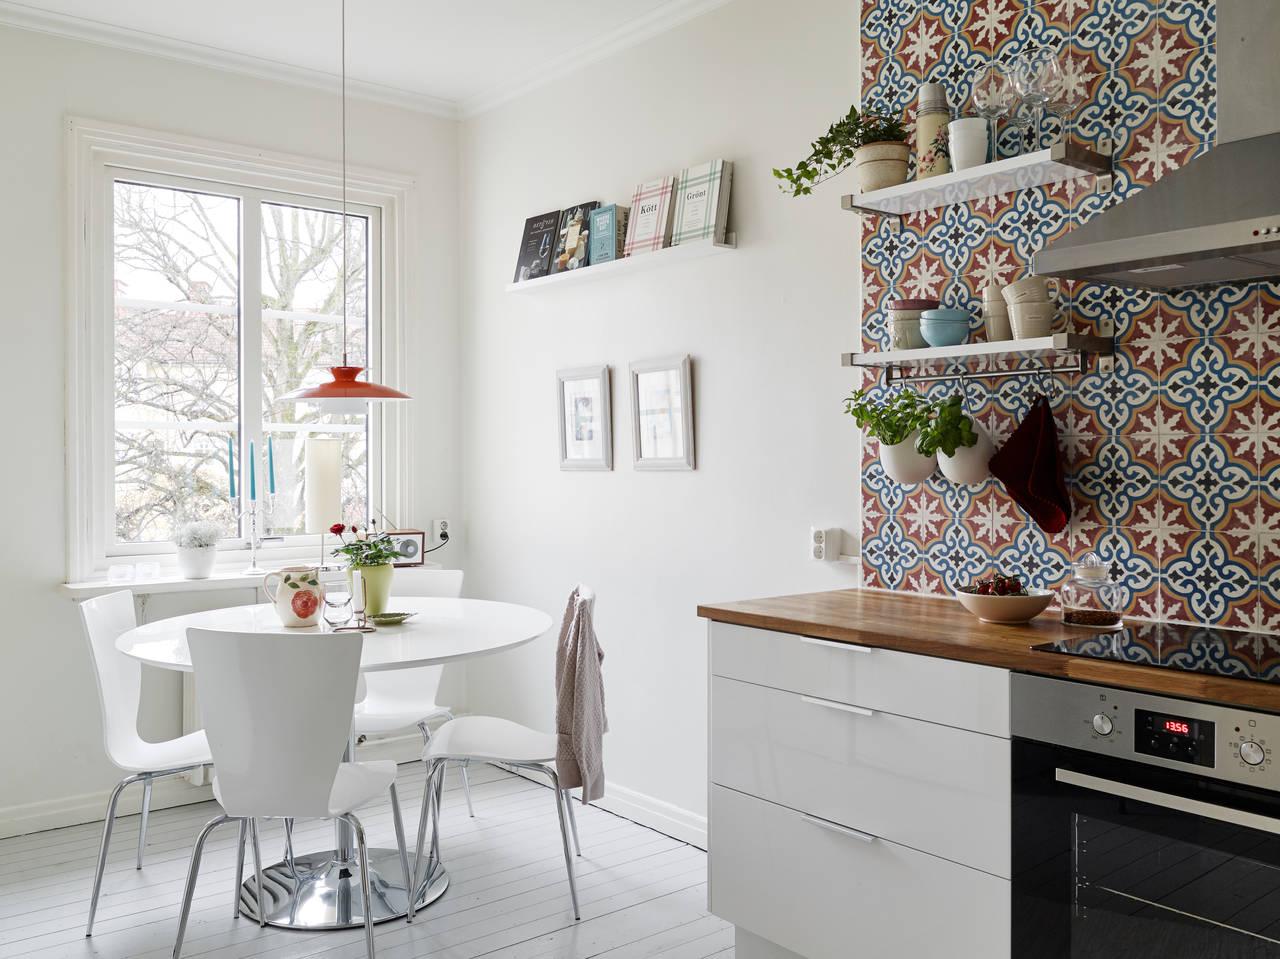 Design Wandtegels Keuken : Marokkaanse wandtegels keuken thomas gaspersz